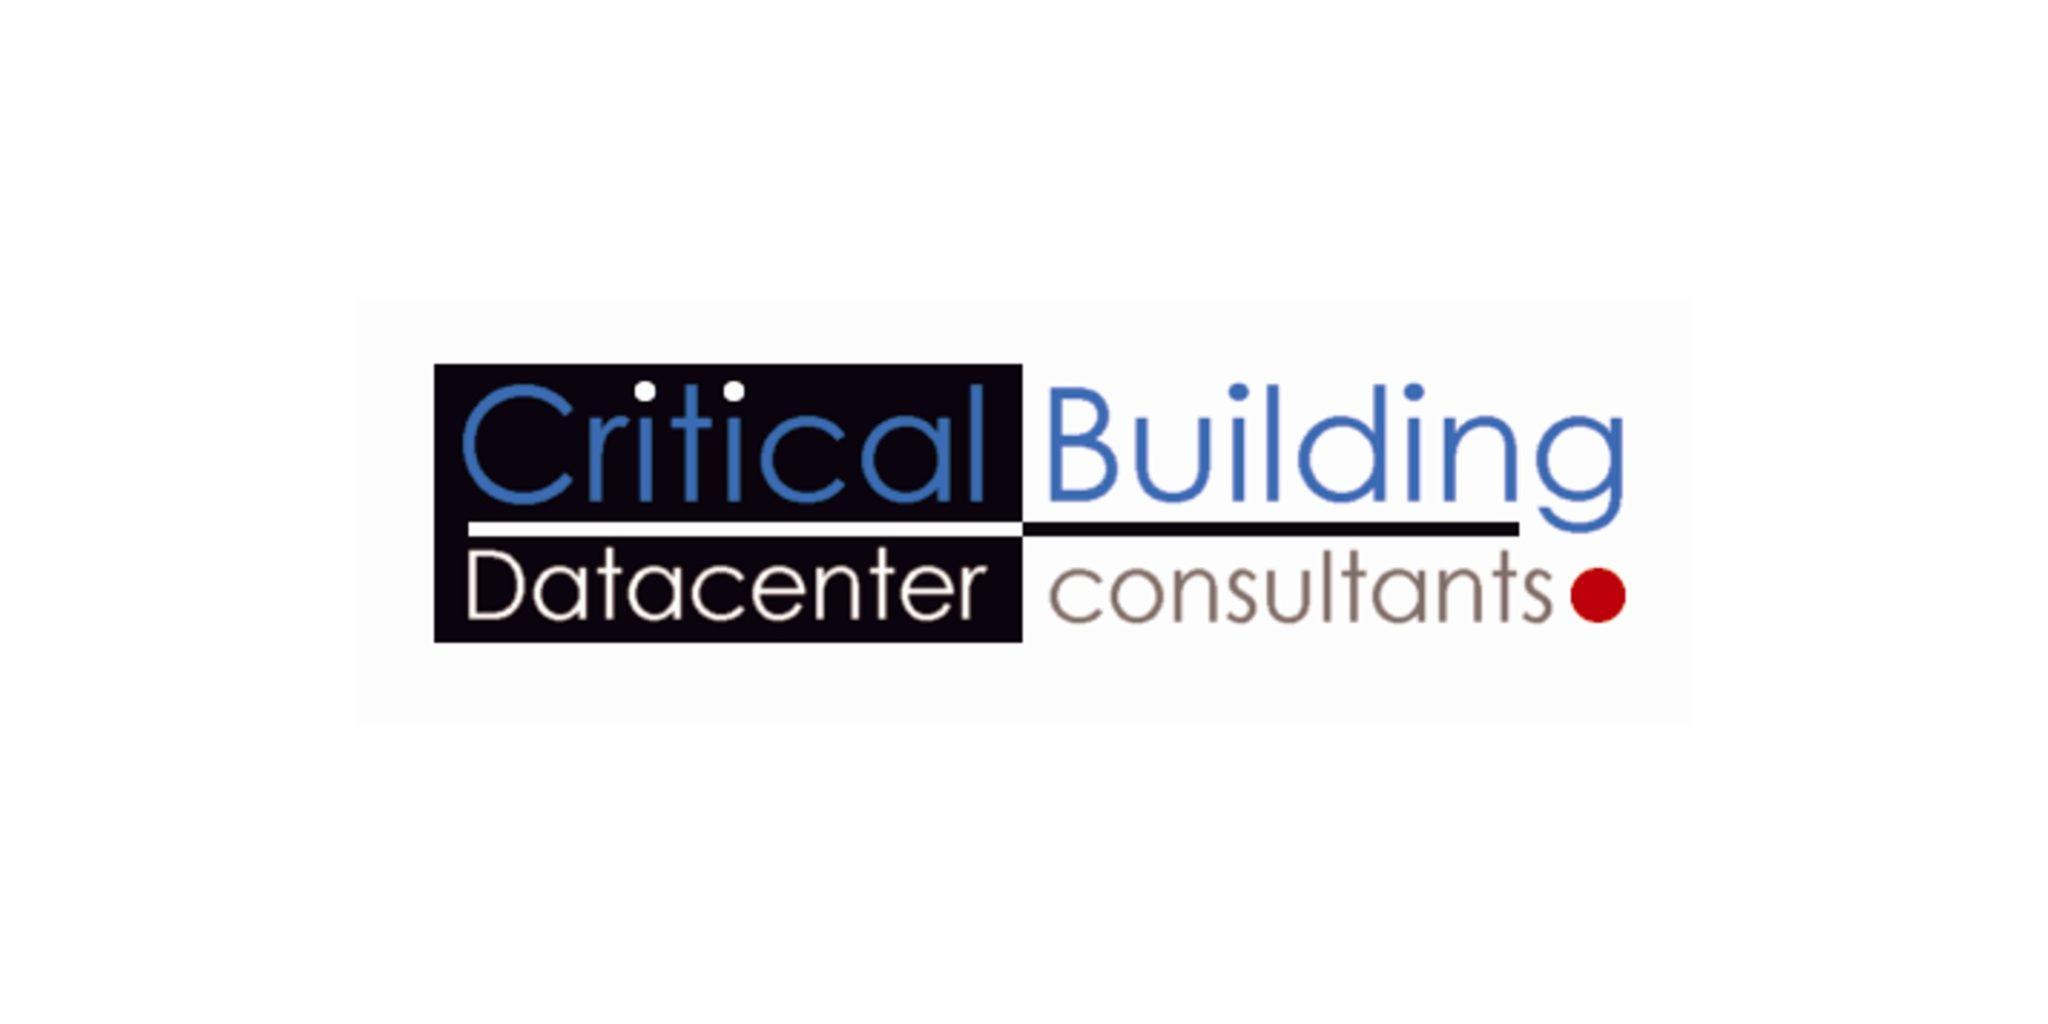 CRITICAL BUILDING